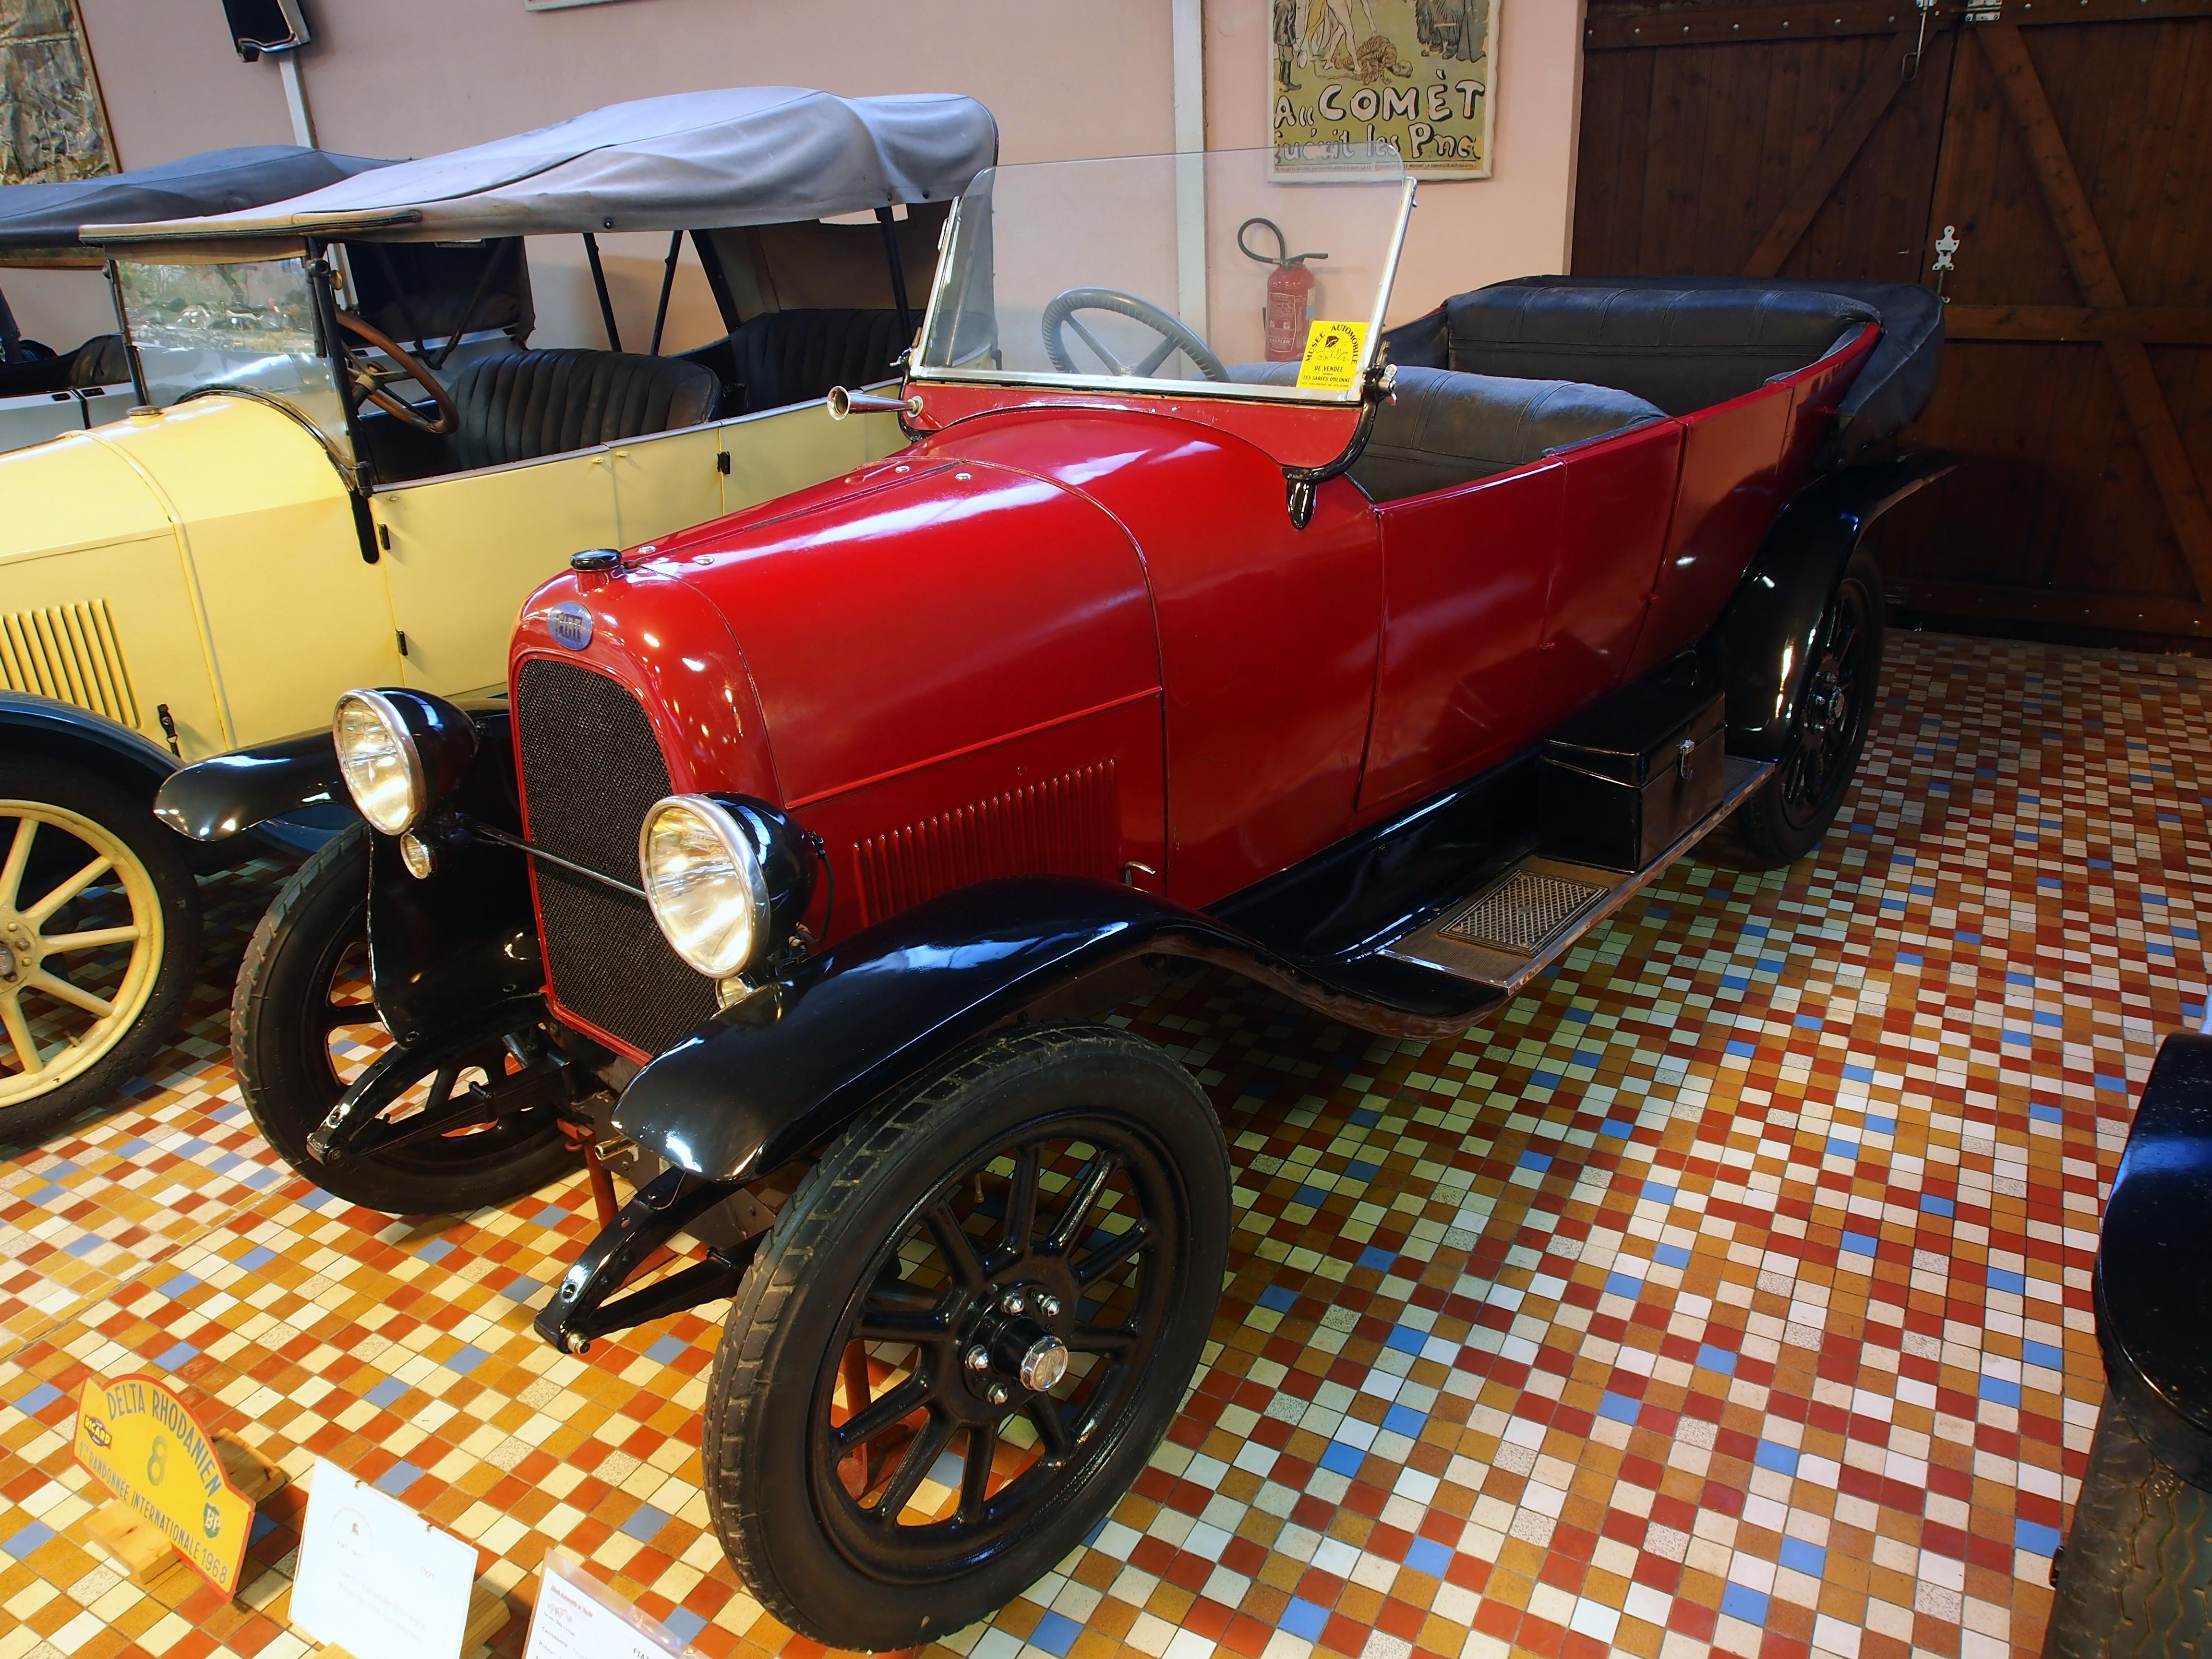 file 1921 fiat 501 torpedo 10cv 1450cc 4cyl at the mus e automobile de vend e pic 1 jpg. Black Bedroom Furniture Sets. Home Design Ideas